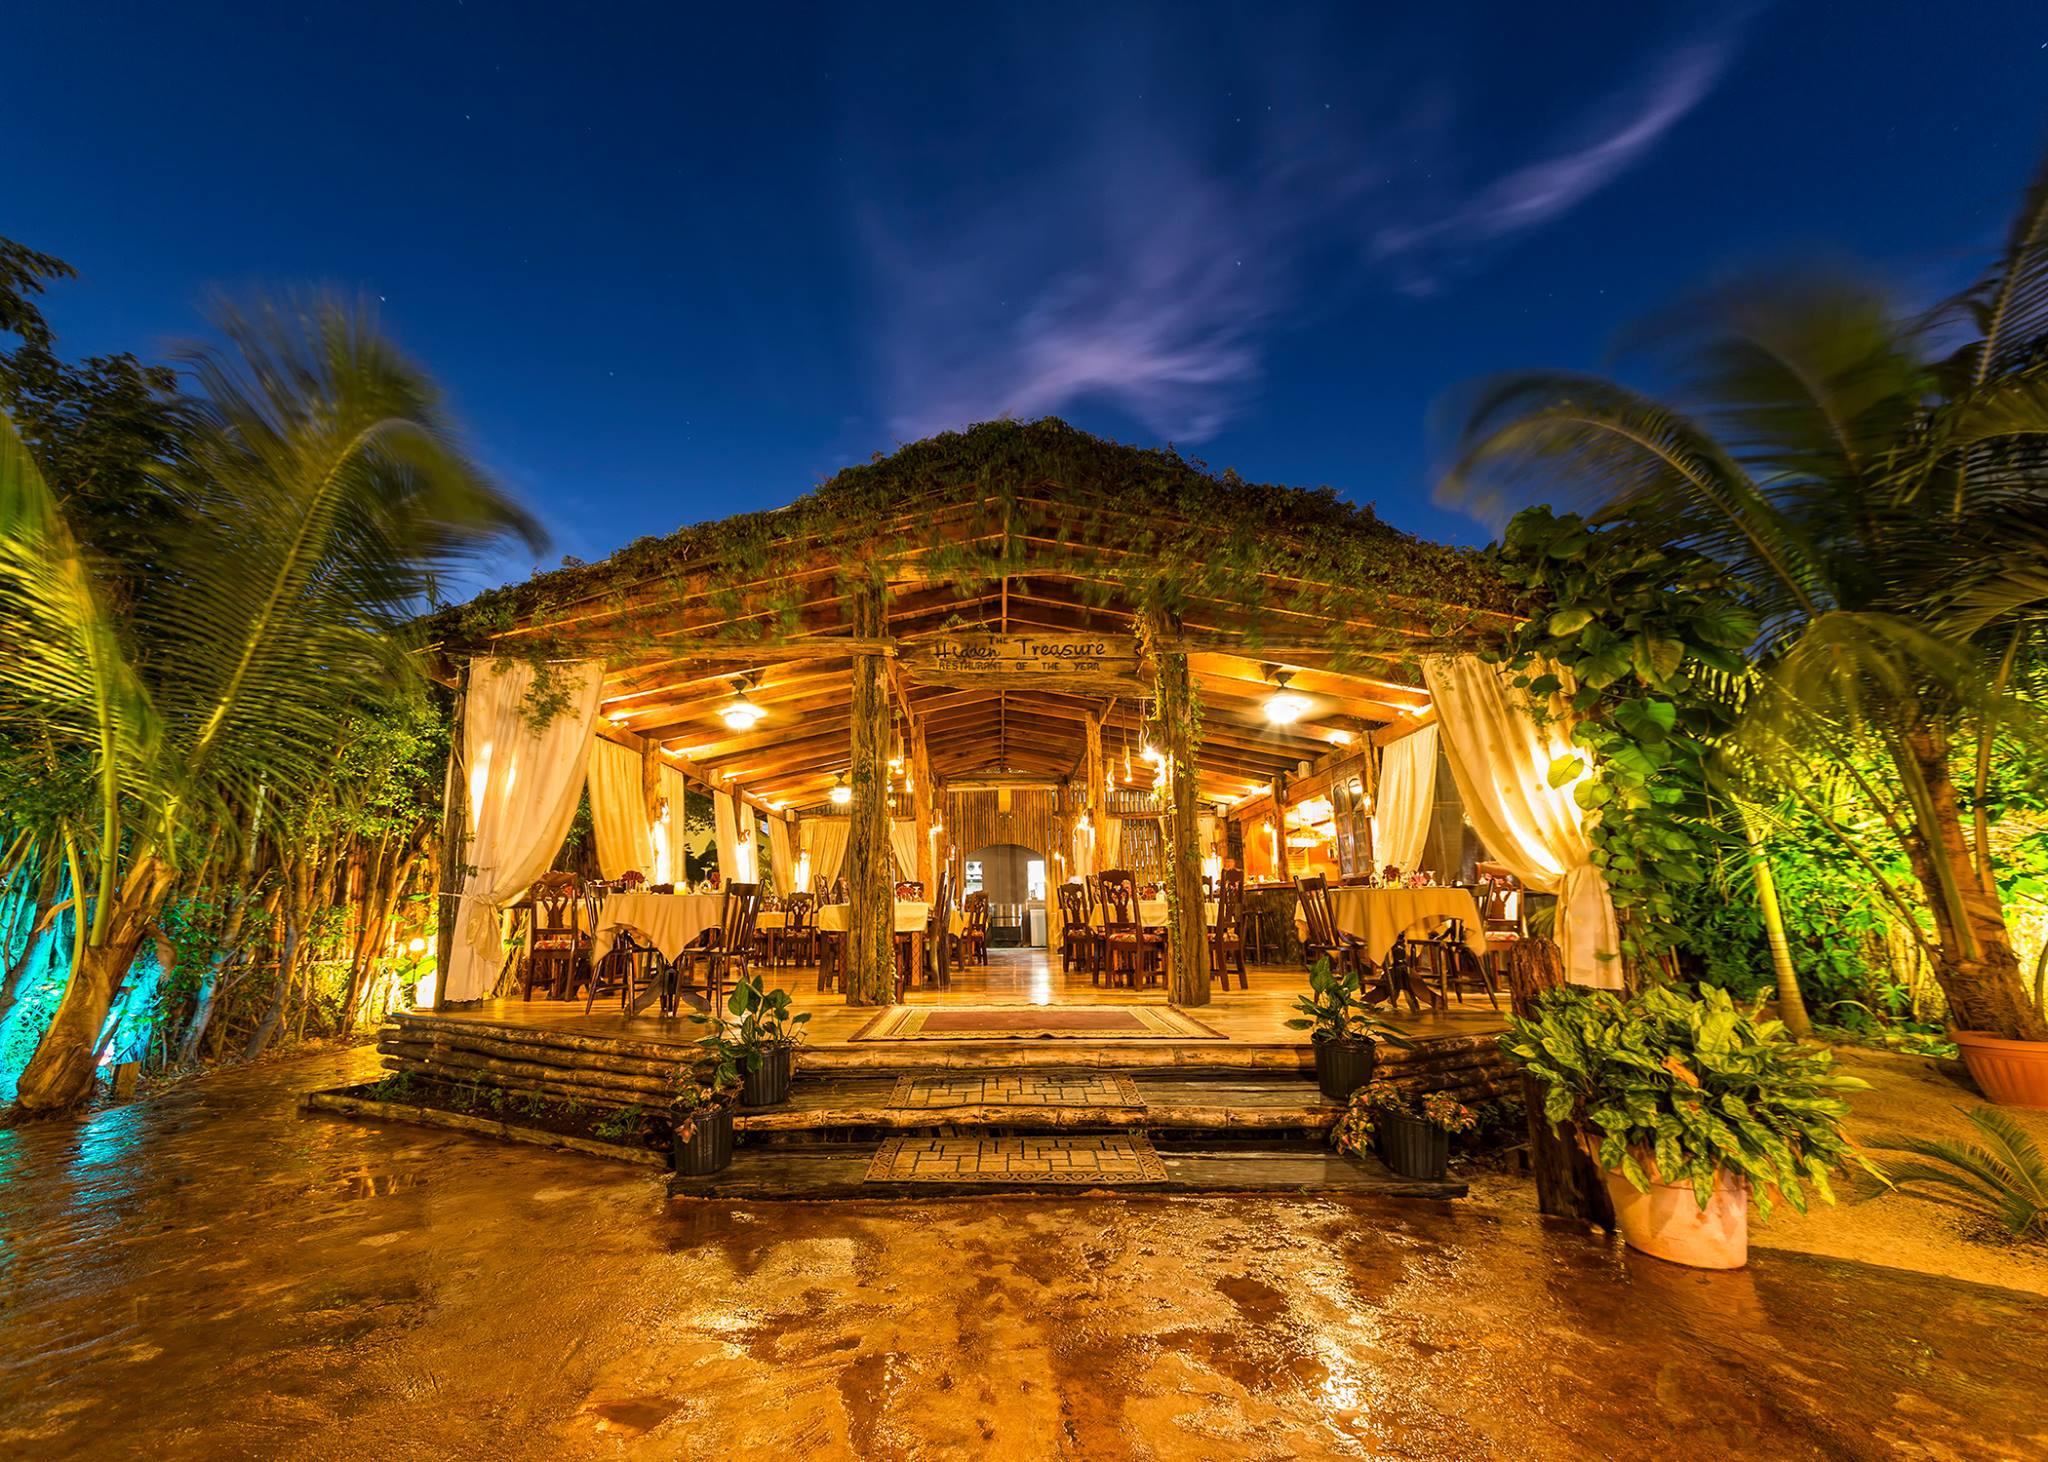 sunday - july 28 - 8:00pm - Hidden Treasure Restaurant(season 4 - big reveal) Attire: All White